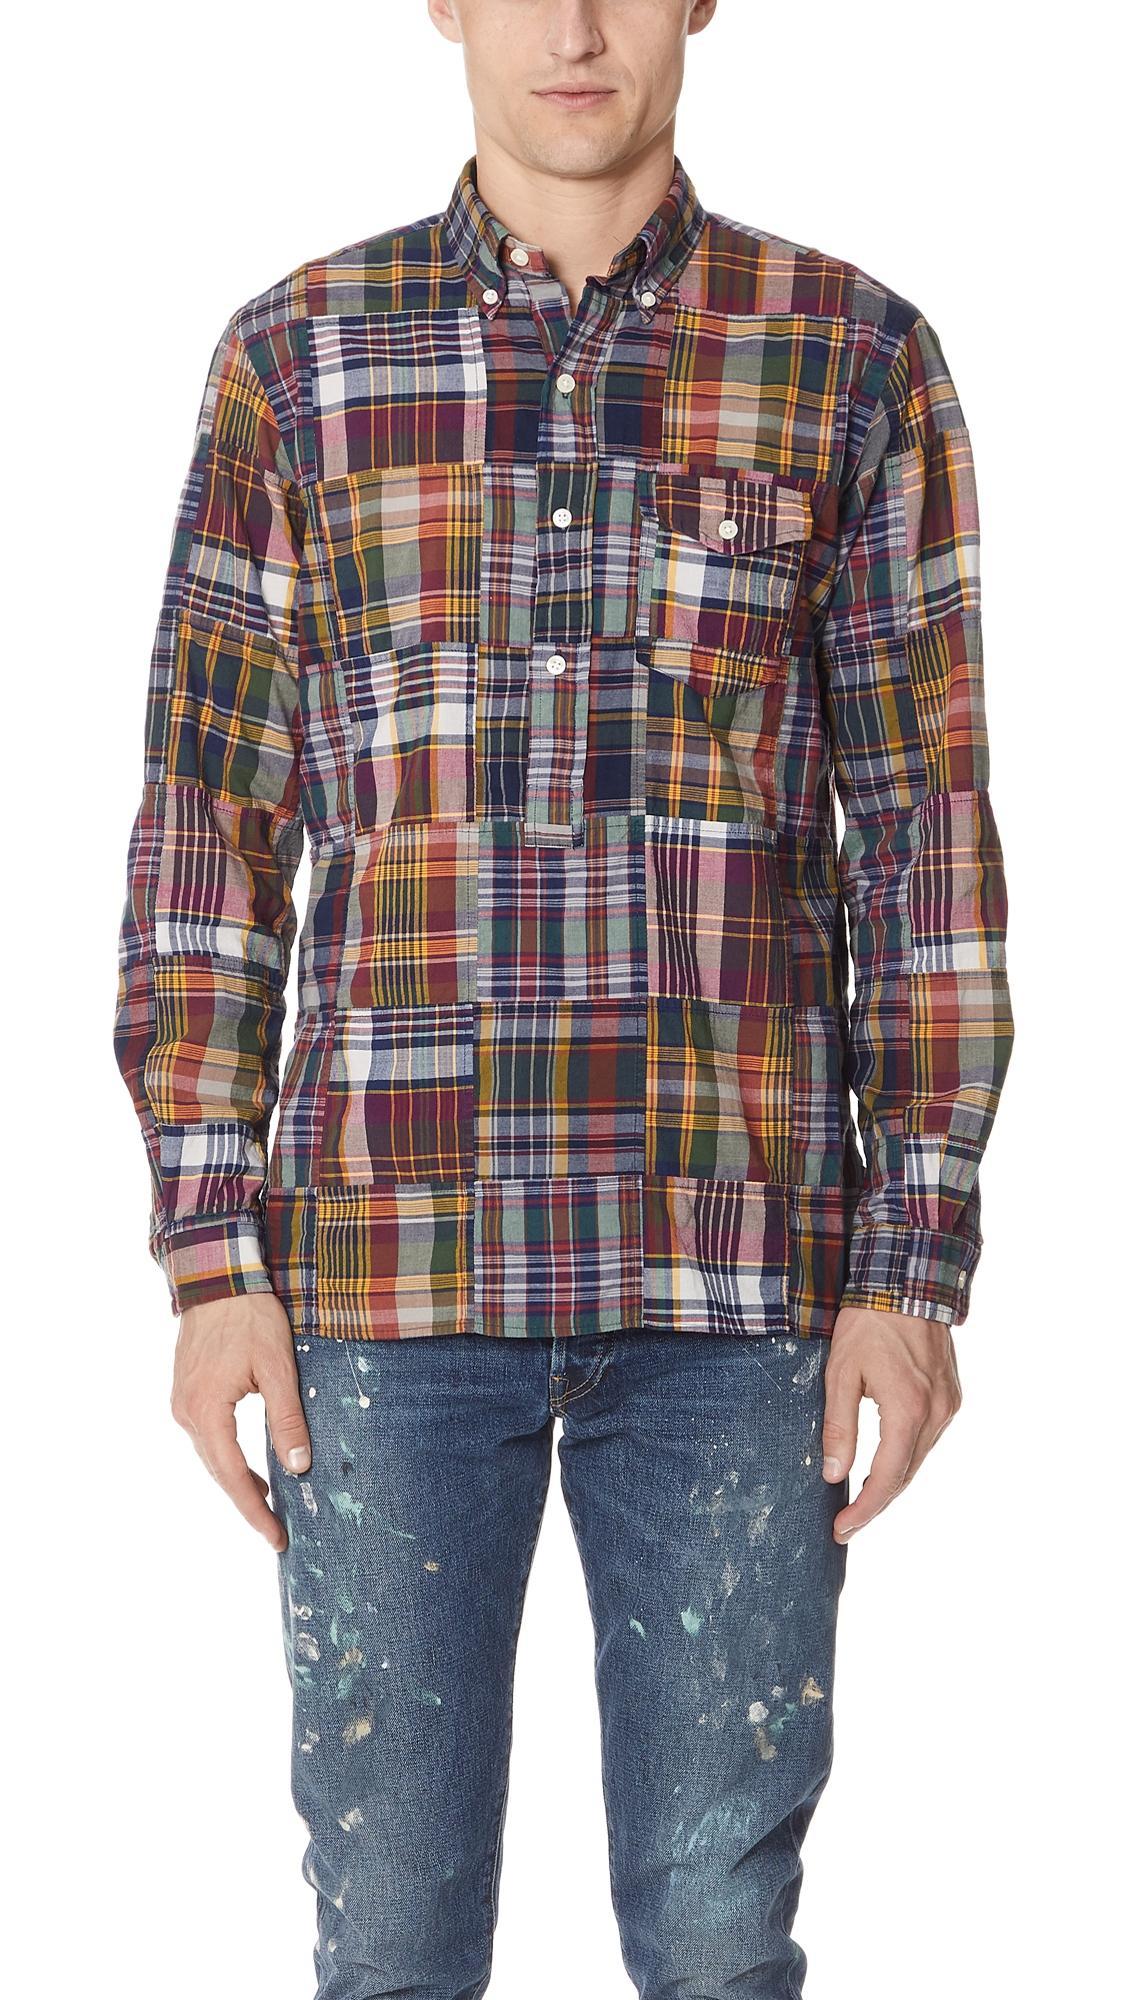 ad10f8b9 Polo Ralph Lauren Patchwork Madras Shirt In Multi   ModeSens